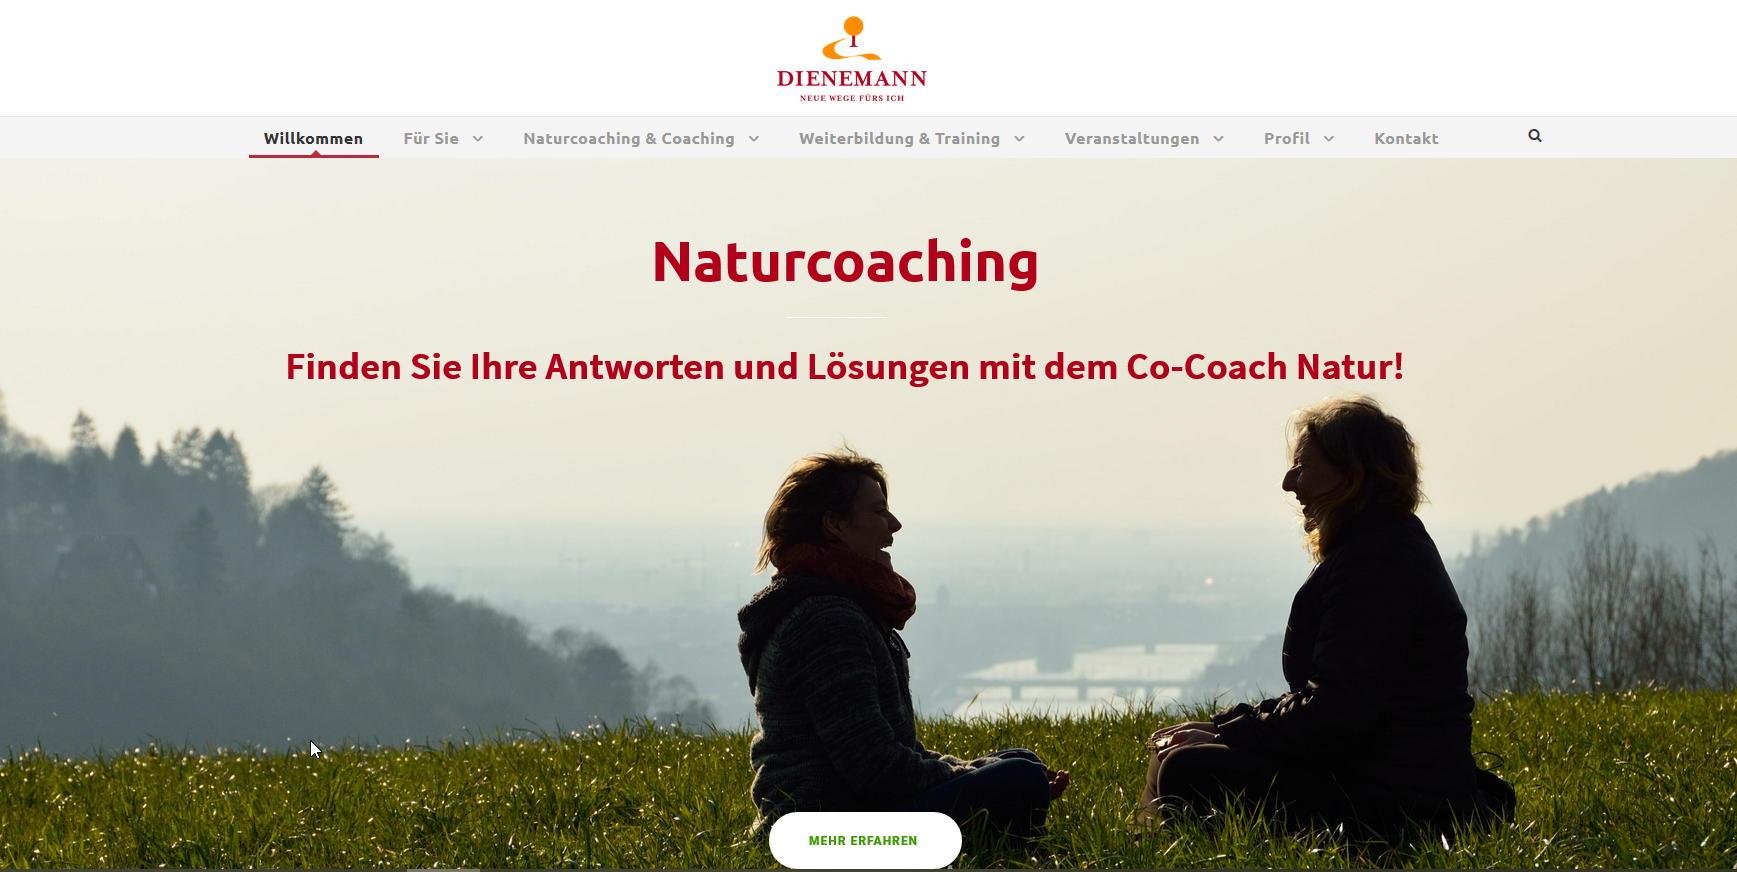 Katja Dienemann Naturcoaching Startseite Web